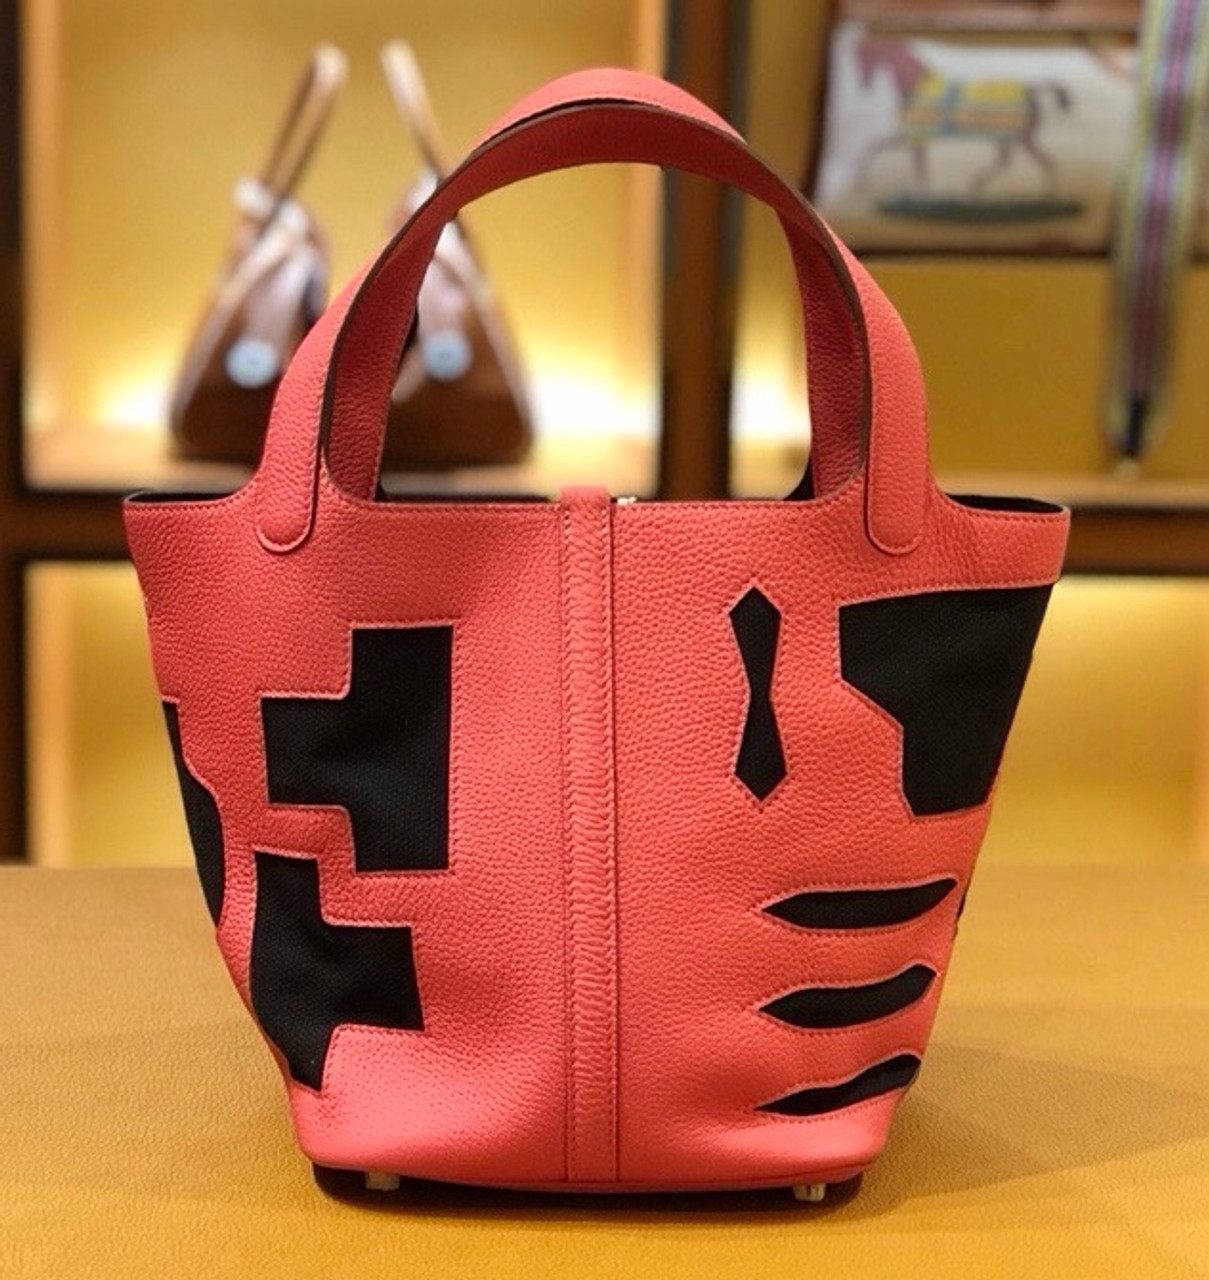 de7f33540dcd ... amazon hermes petit h limited edition u5 rose lipstick black picotin  lock 22 togo leather bag